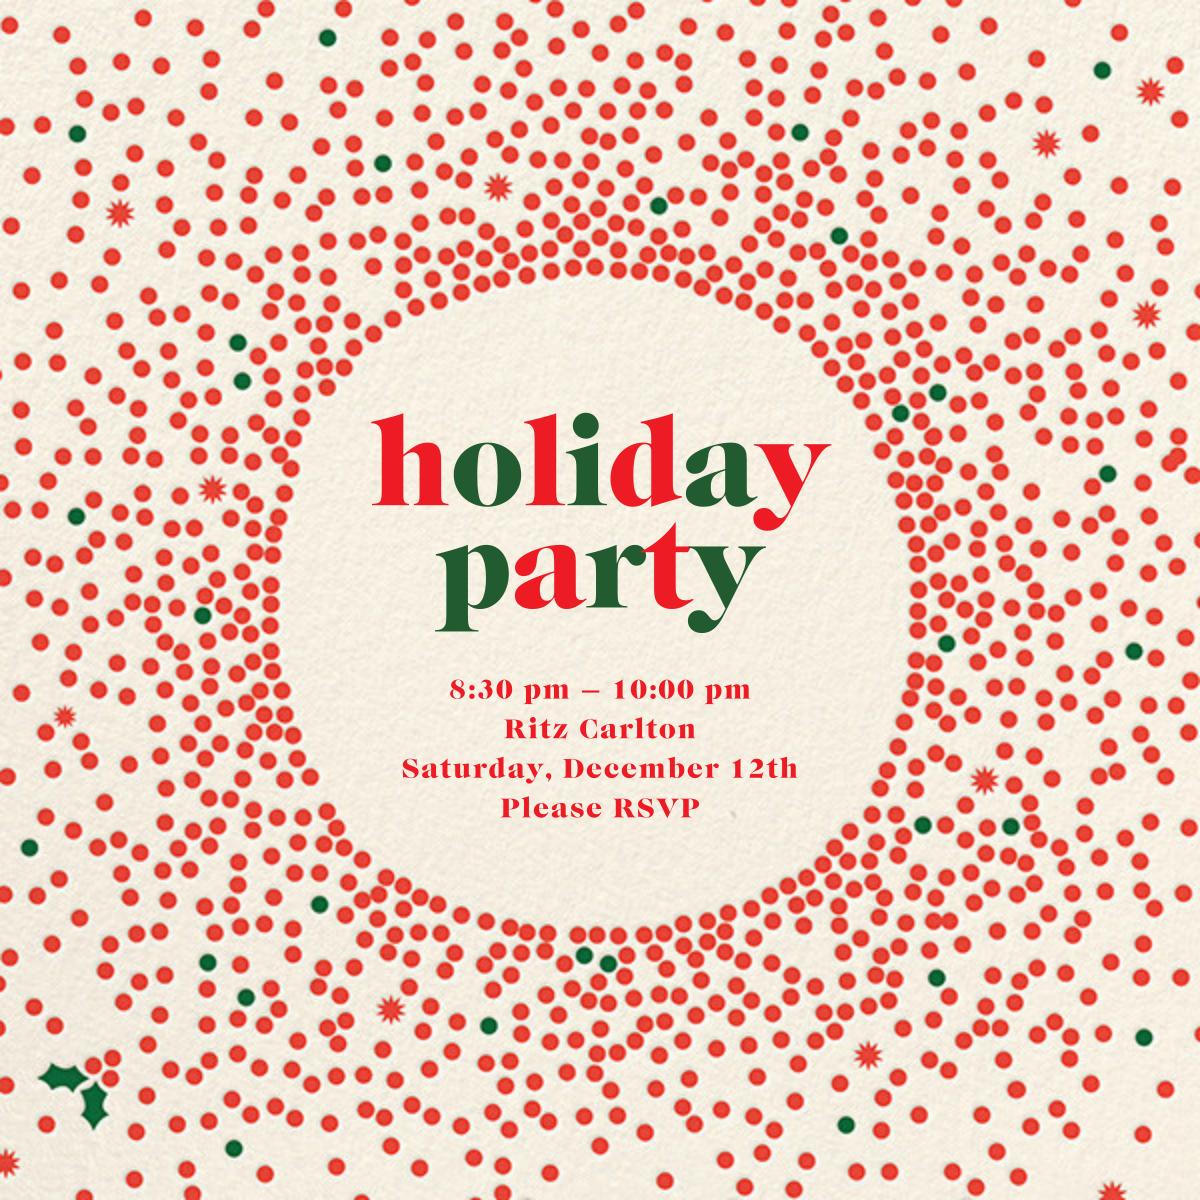 Reverse Snow Globe (Square) - Cream - Cheree Berry - Company holiday party